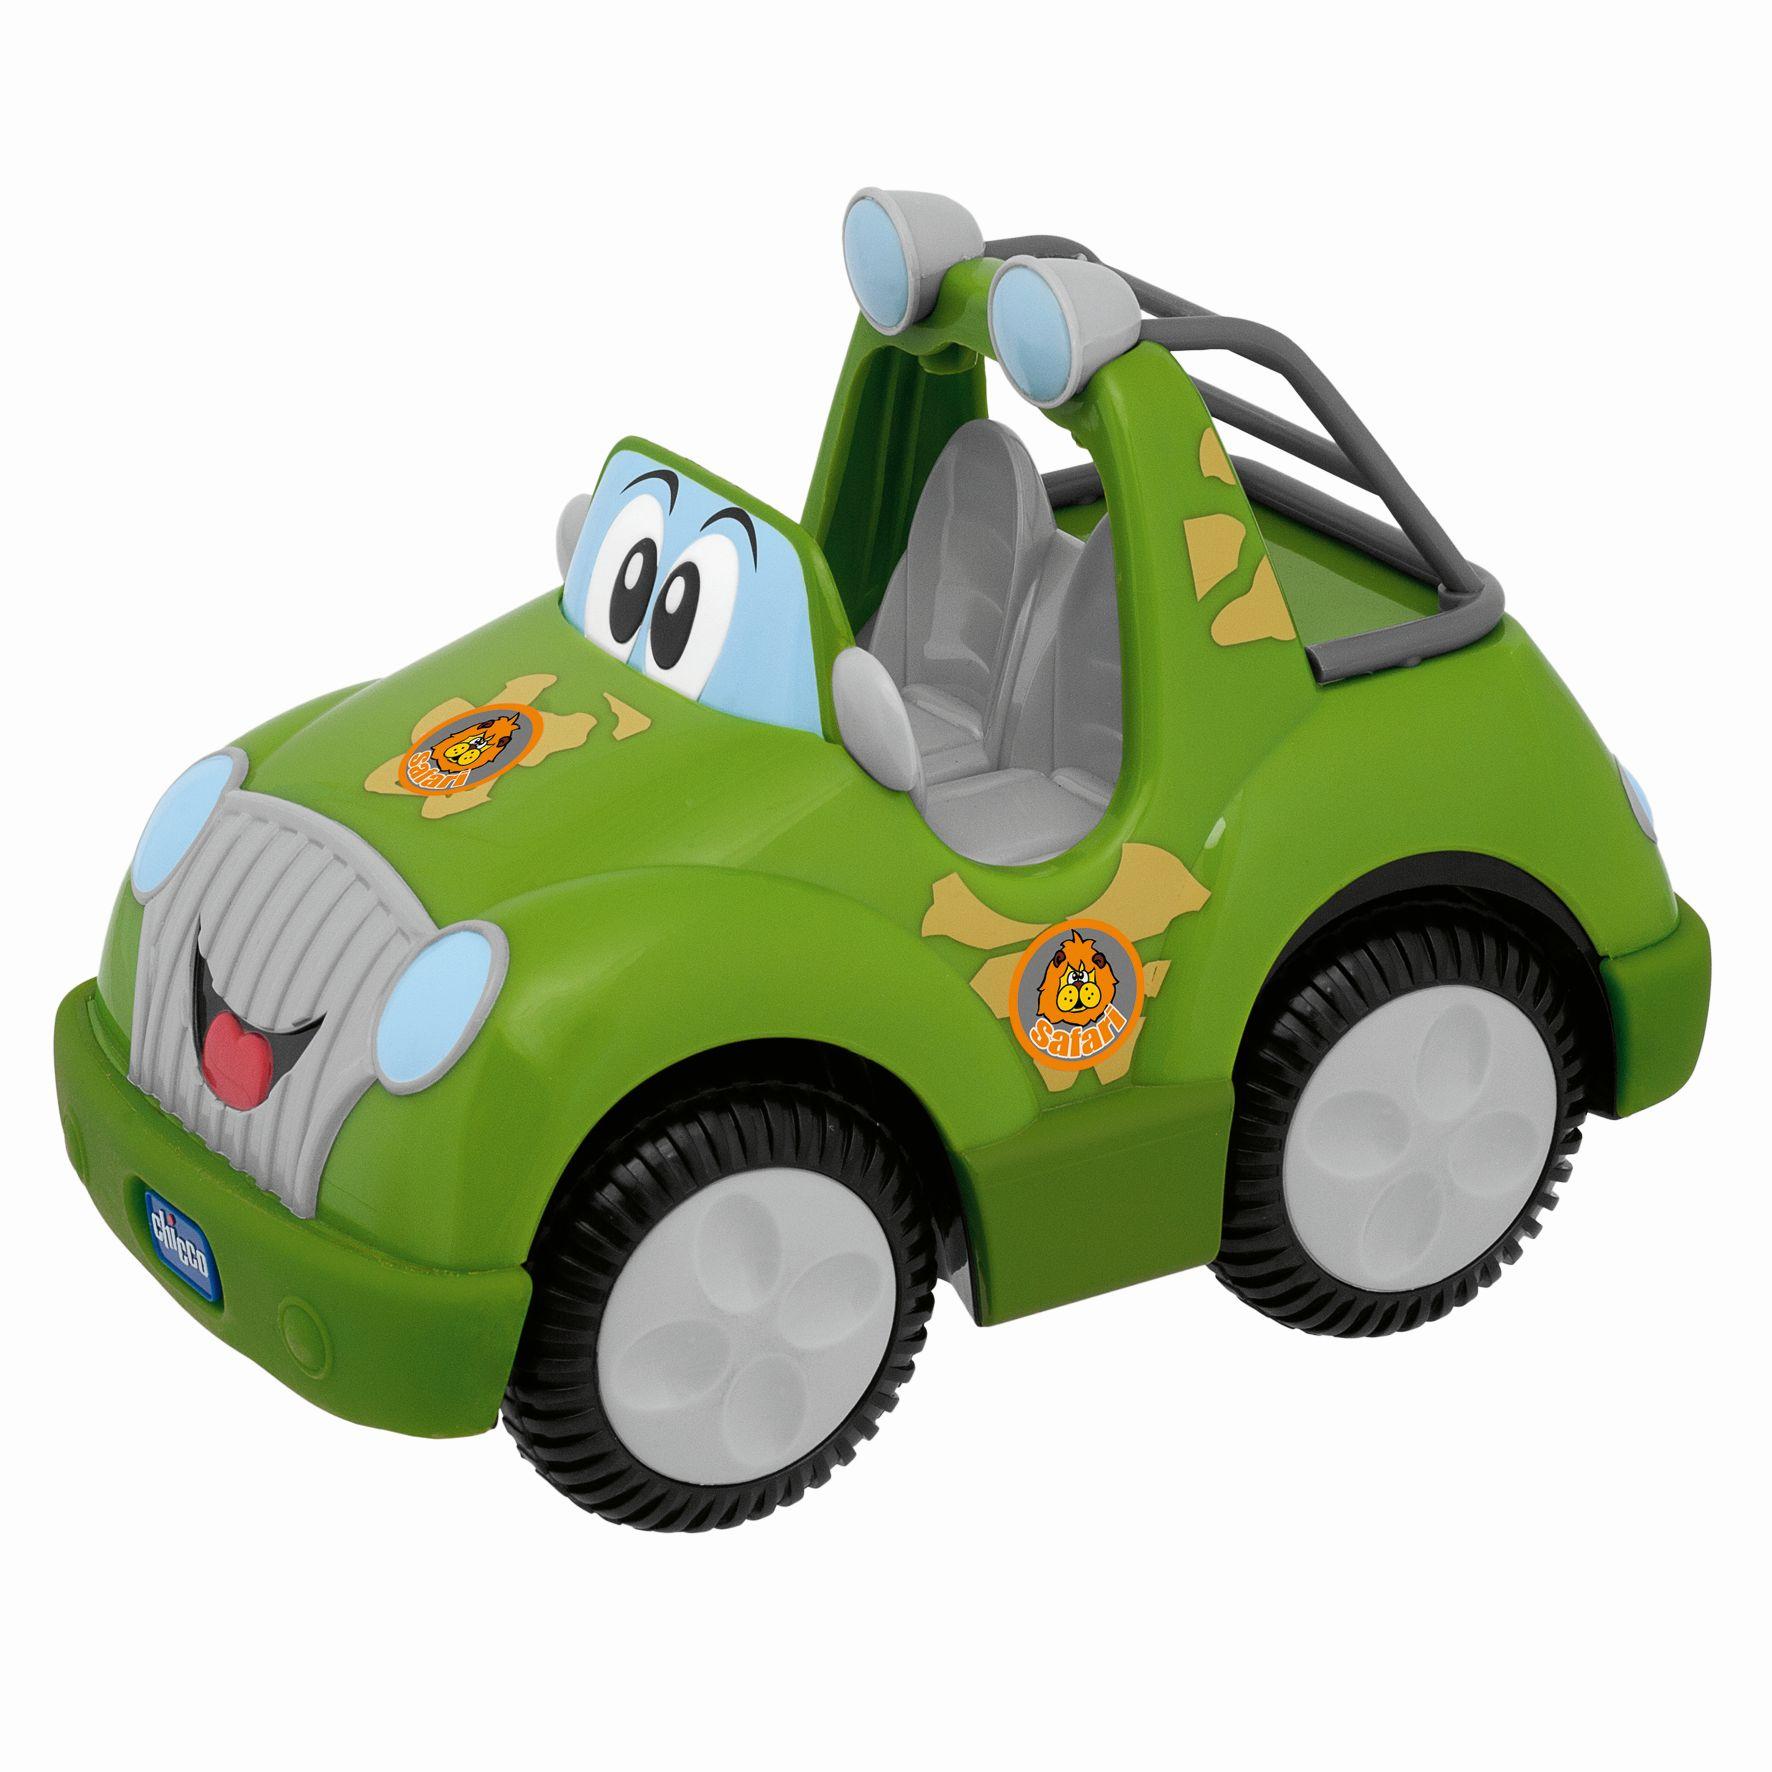 chicco ferngesteuertes auto safari park 2016 online kaufen bei kidsroom spielzeug spielzeug. Black Bedroom Furniture Sets. Home Design Ideas